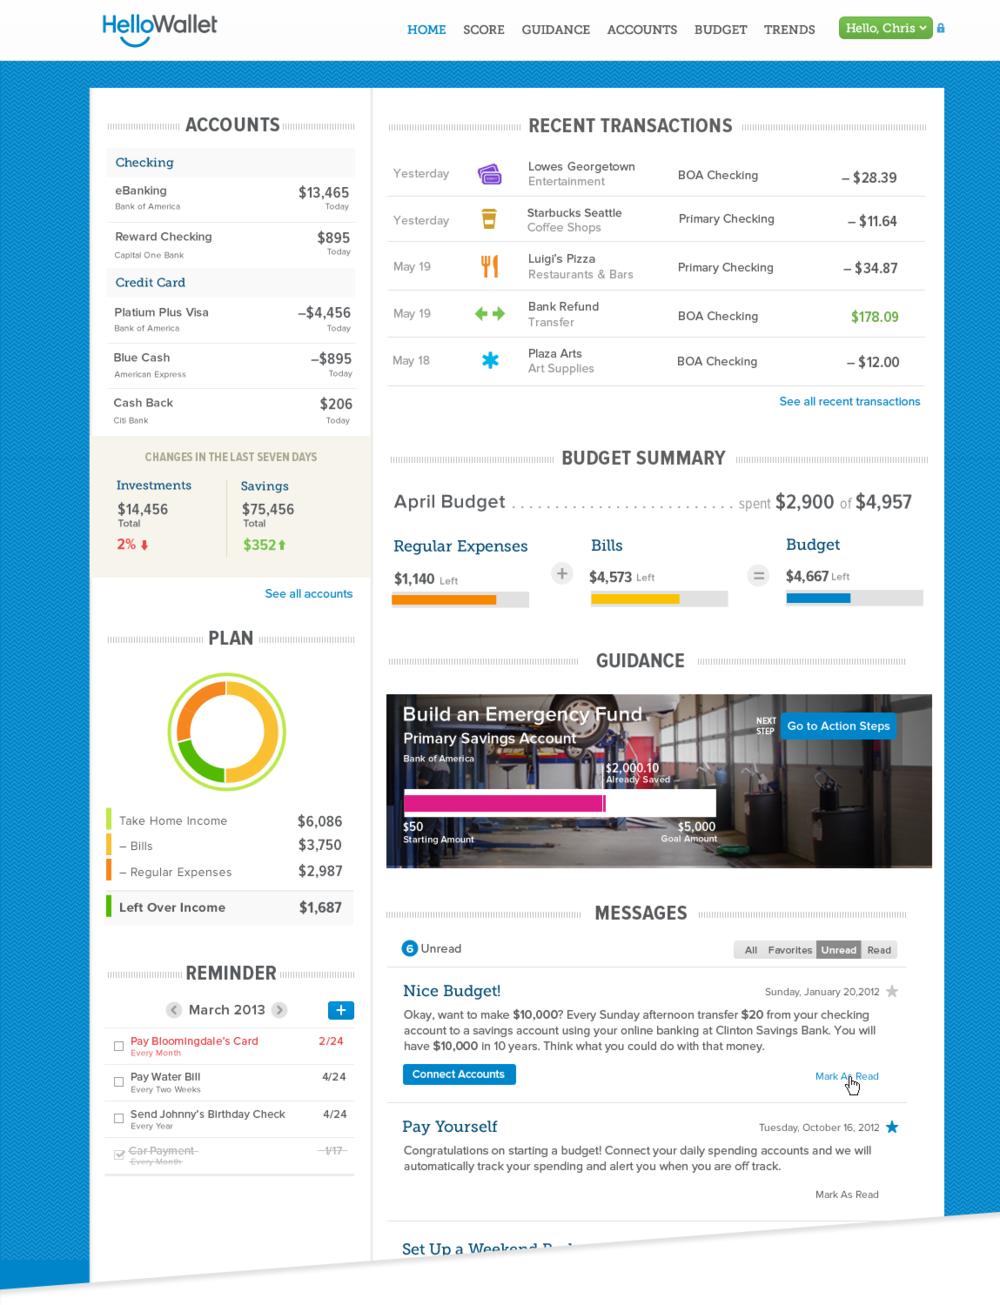 Mockup of HelloWallet's Dashboard circa 2012